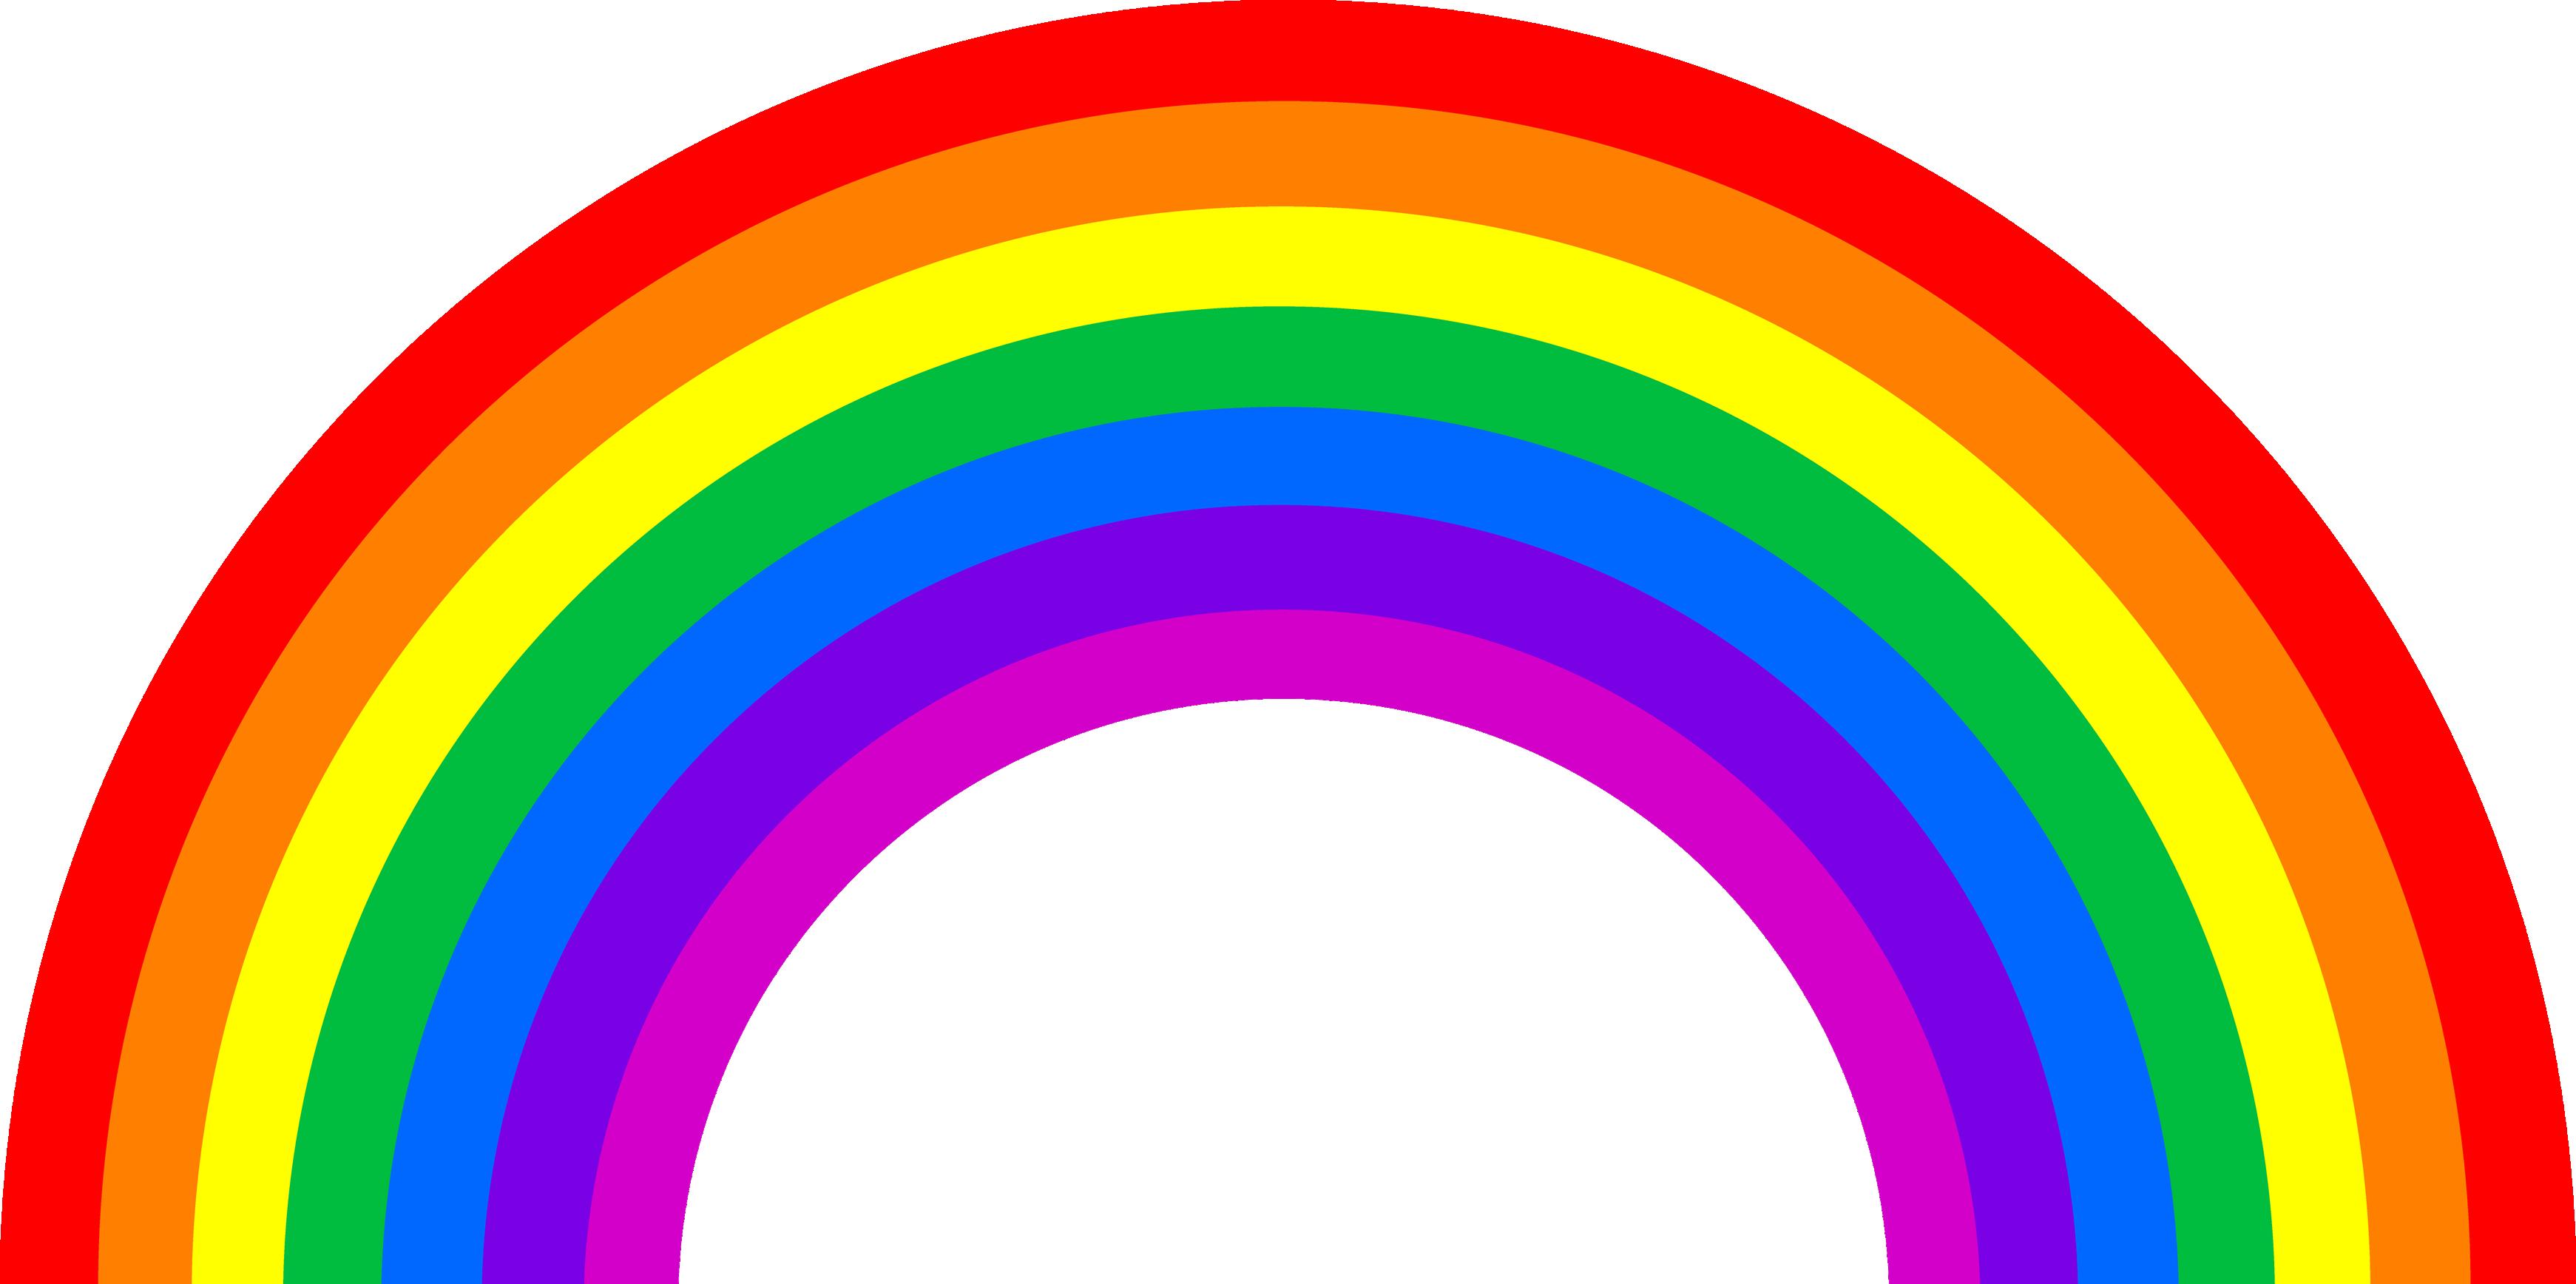 Transparent background rainbow clipart picture transparent Rainbow Transparent Background | Free download best Rainbow ... picture transparent